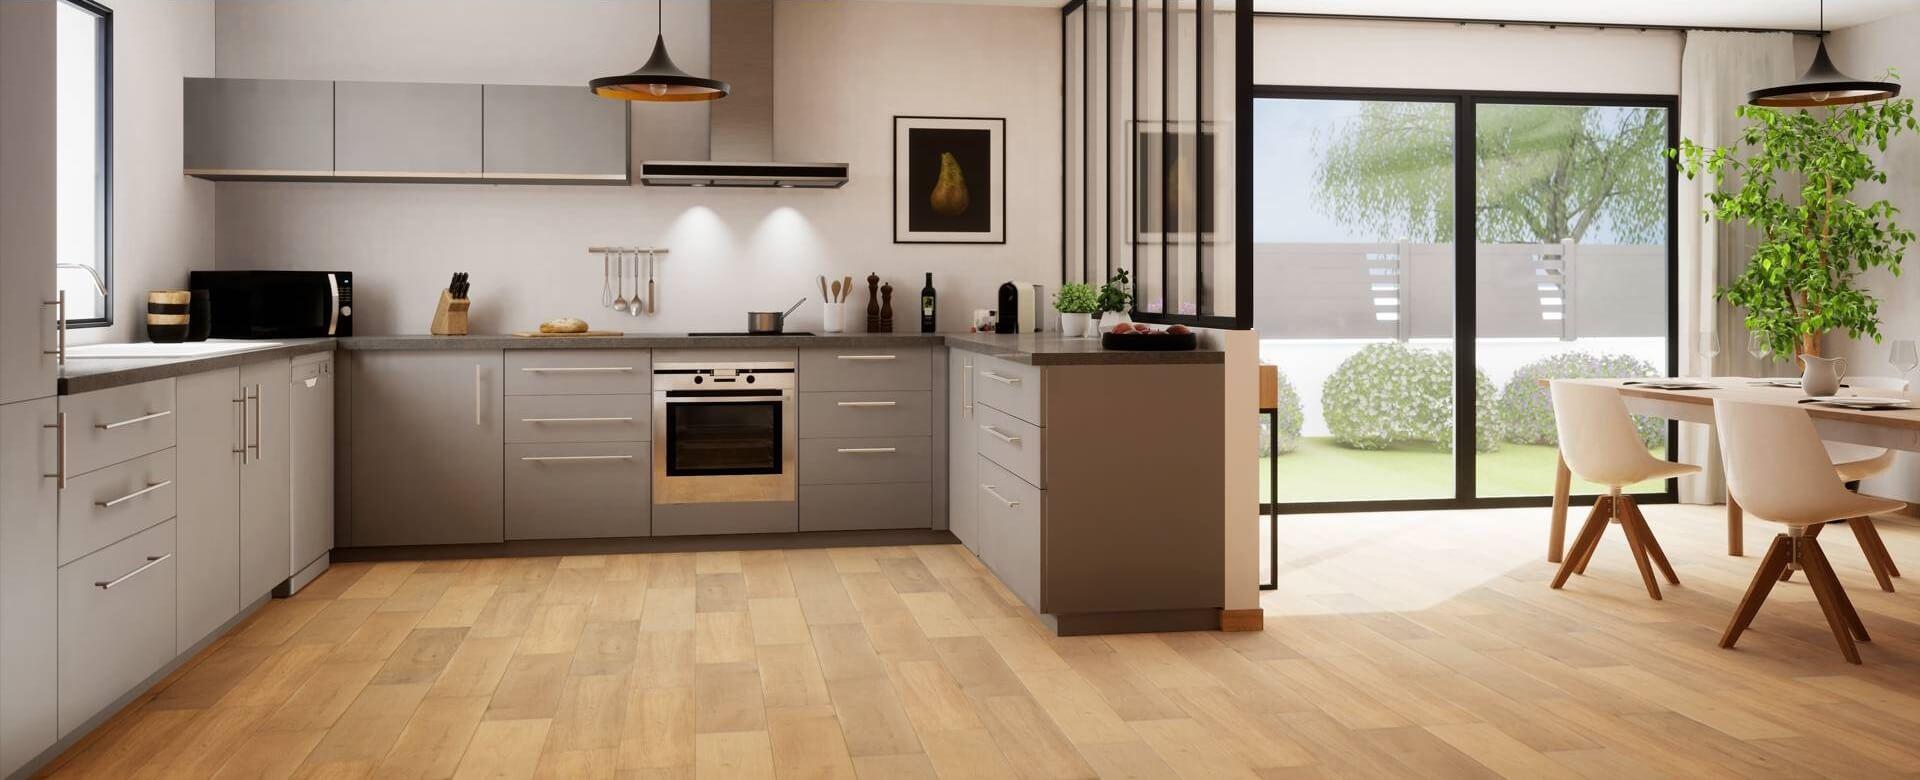 Wood Fashion podłogi do kuchni i jadalni